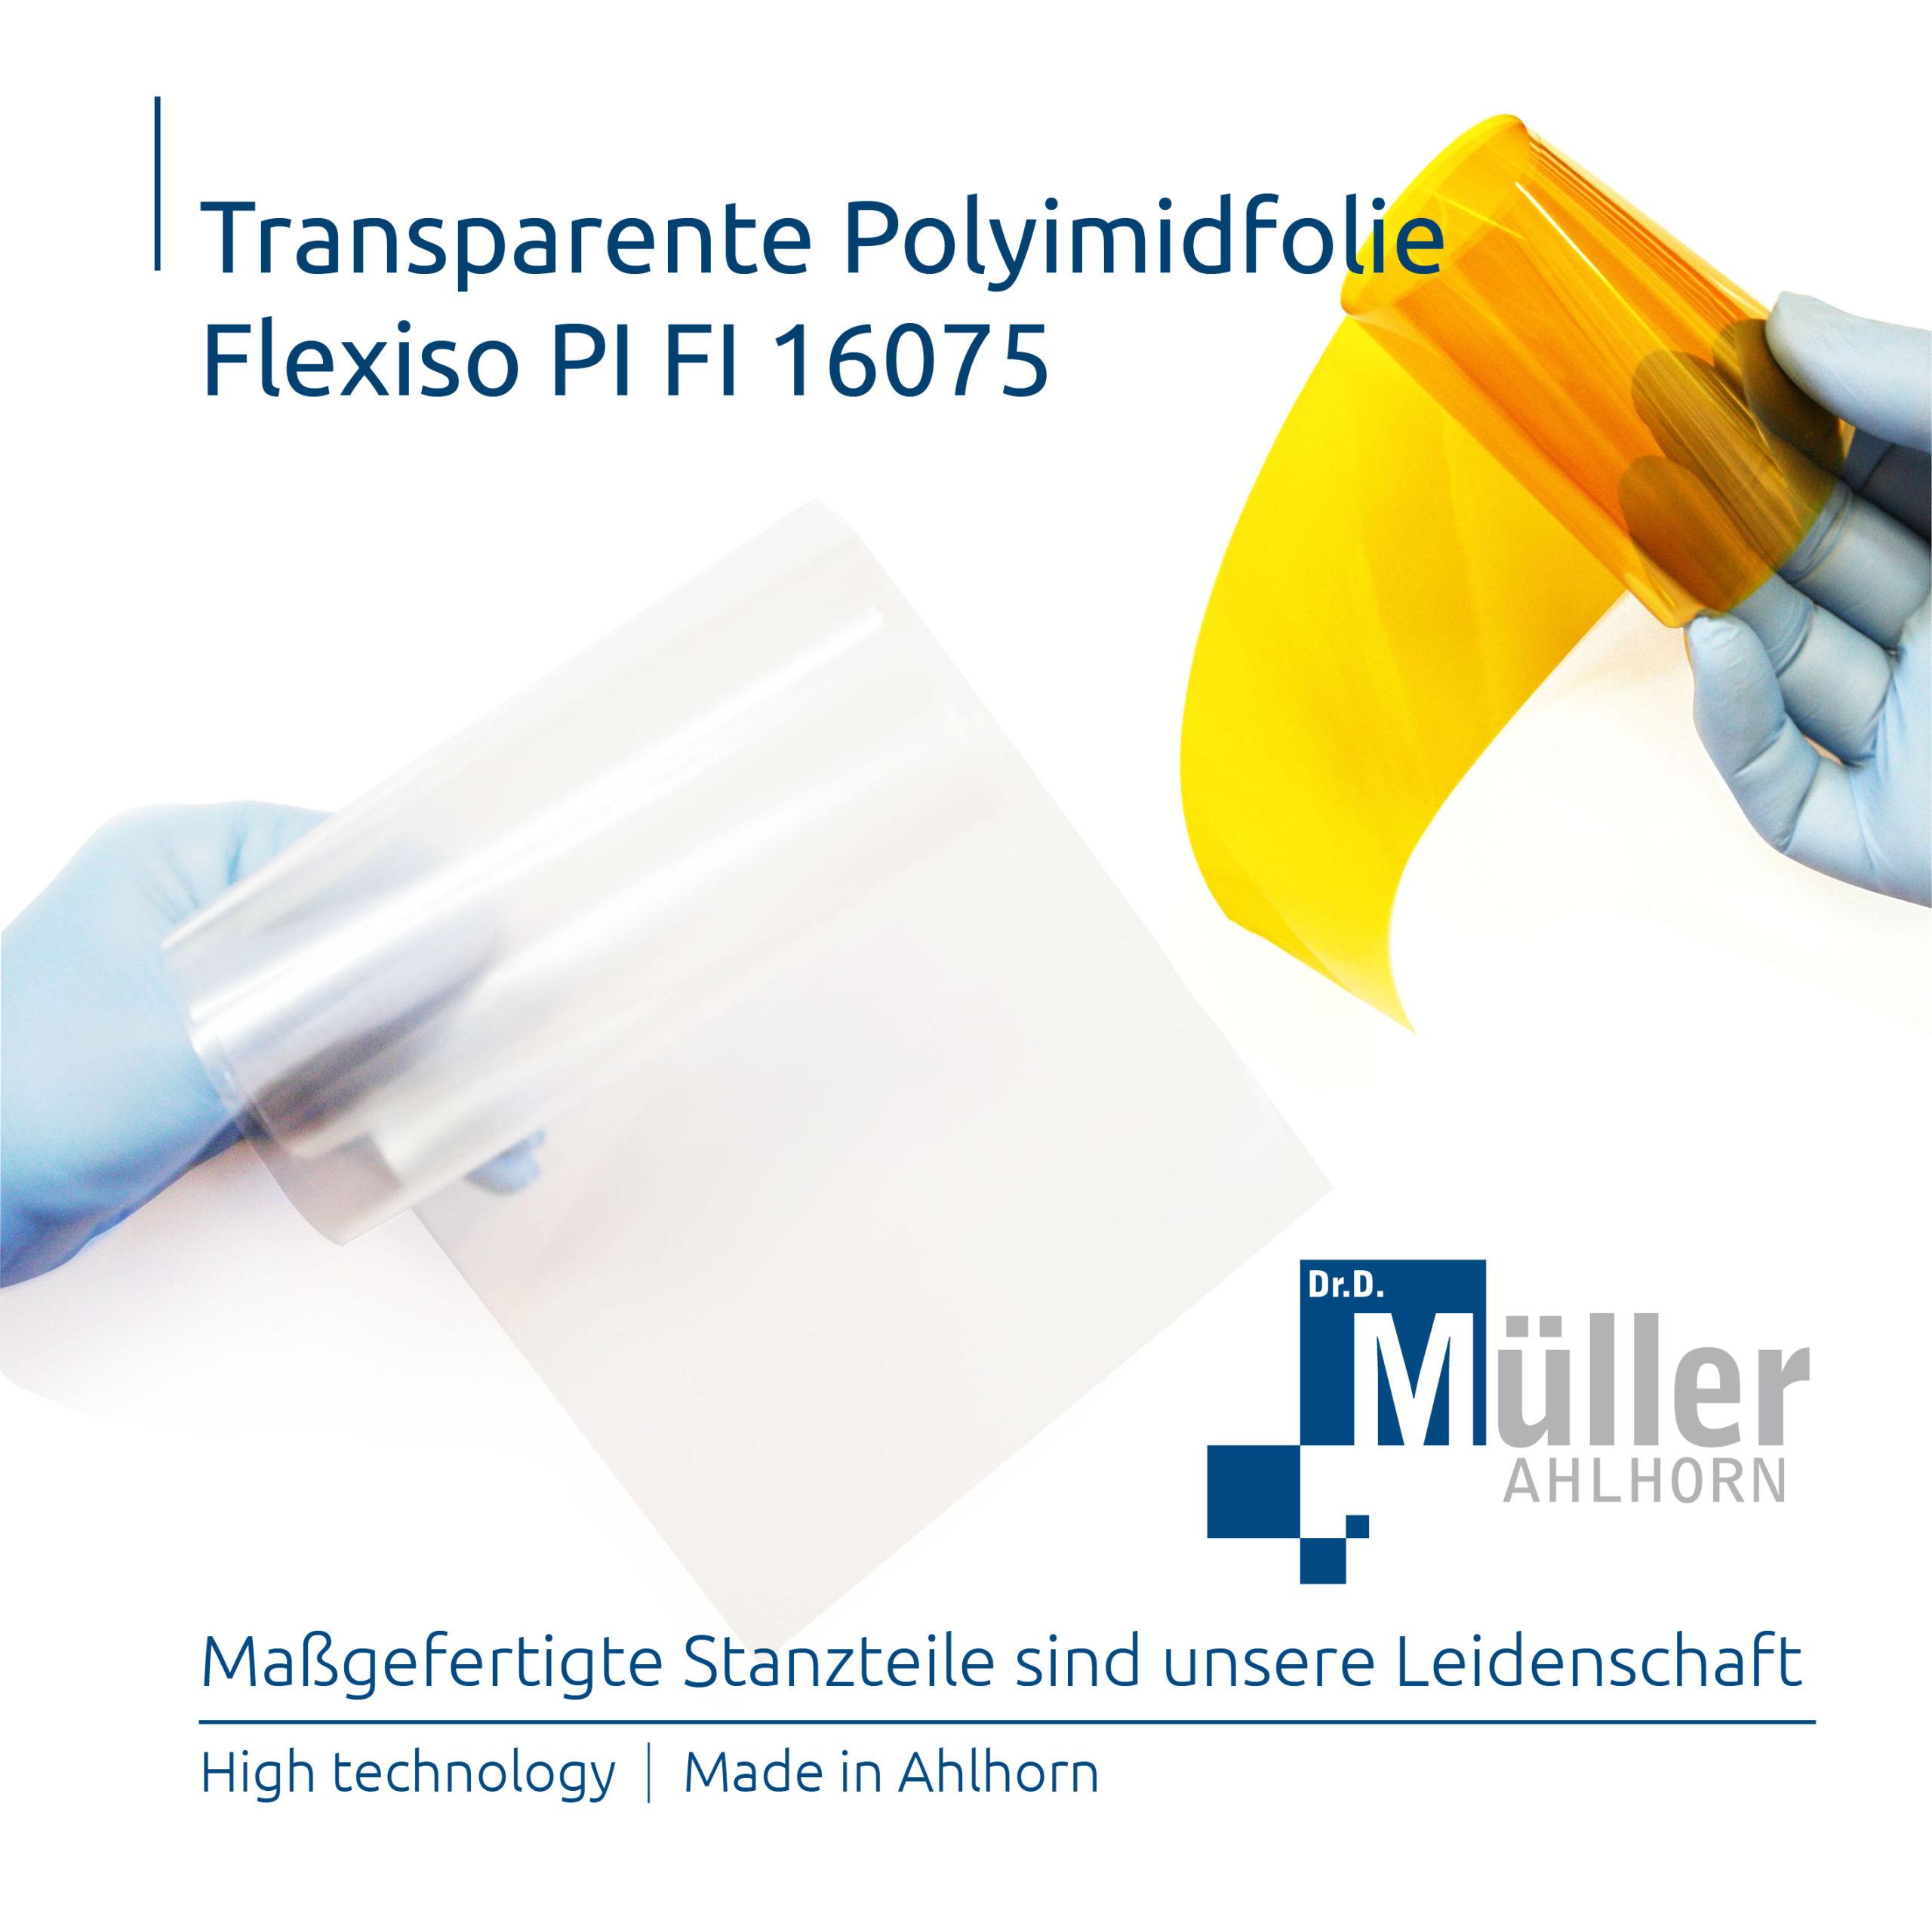 Polyimidfolie Flexiso PI FI 16075